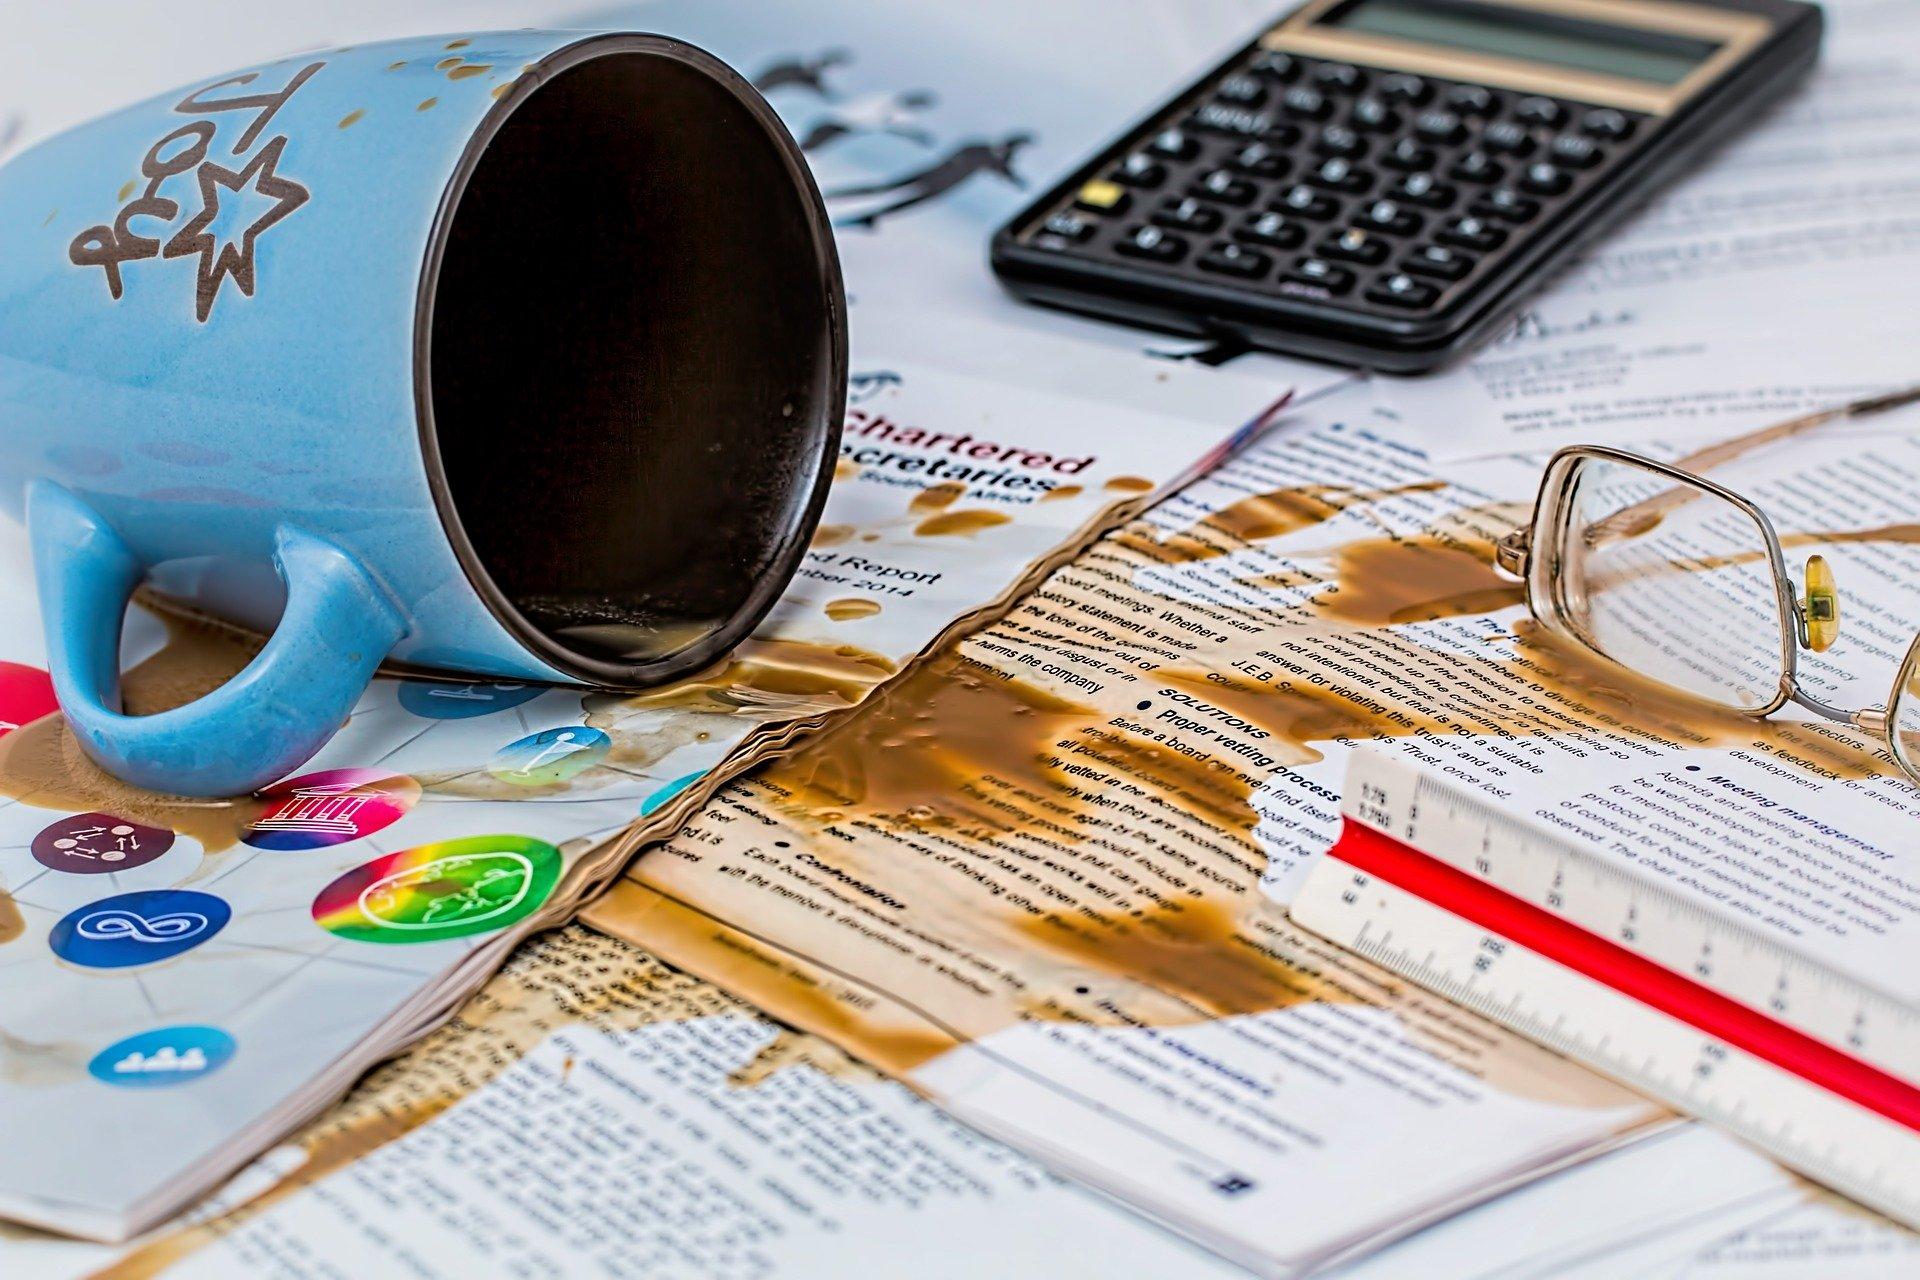 7 Common Marketing Strategy Mistakes Mid-Market Companies Make